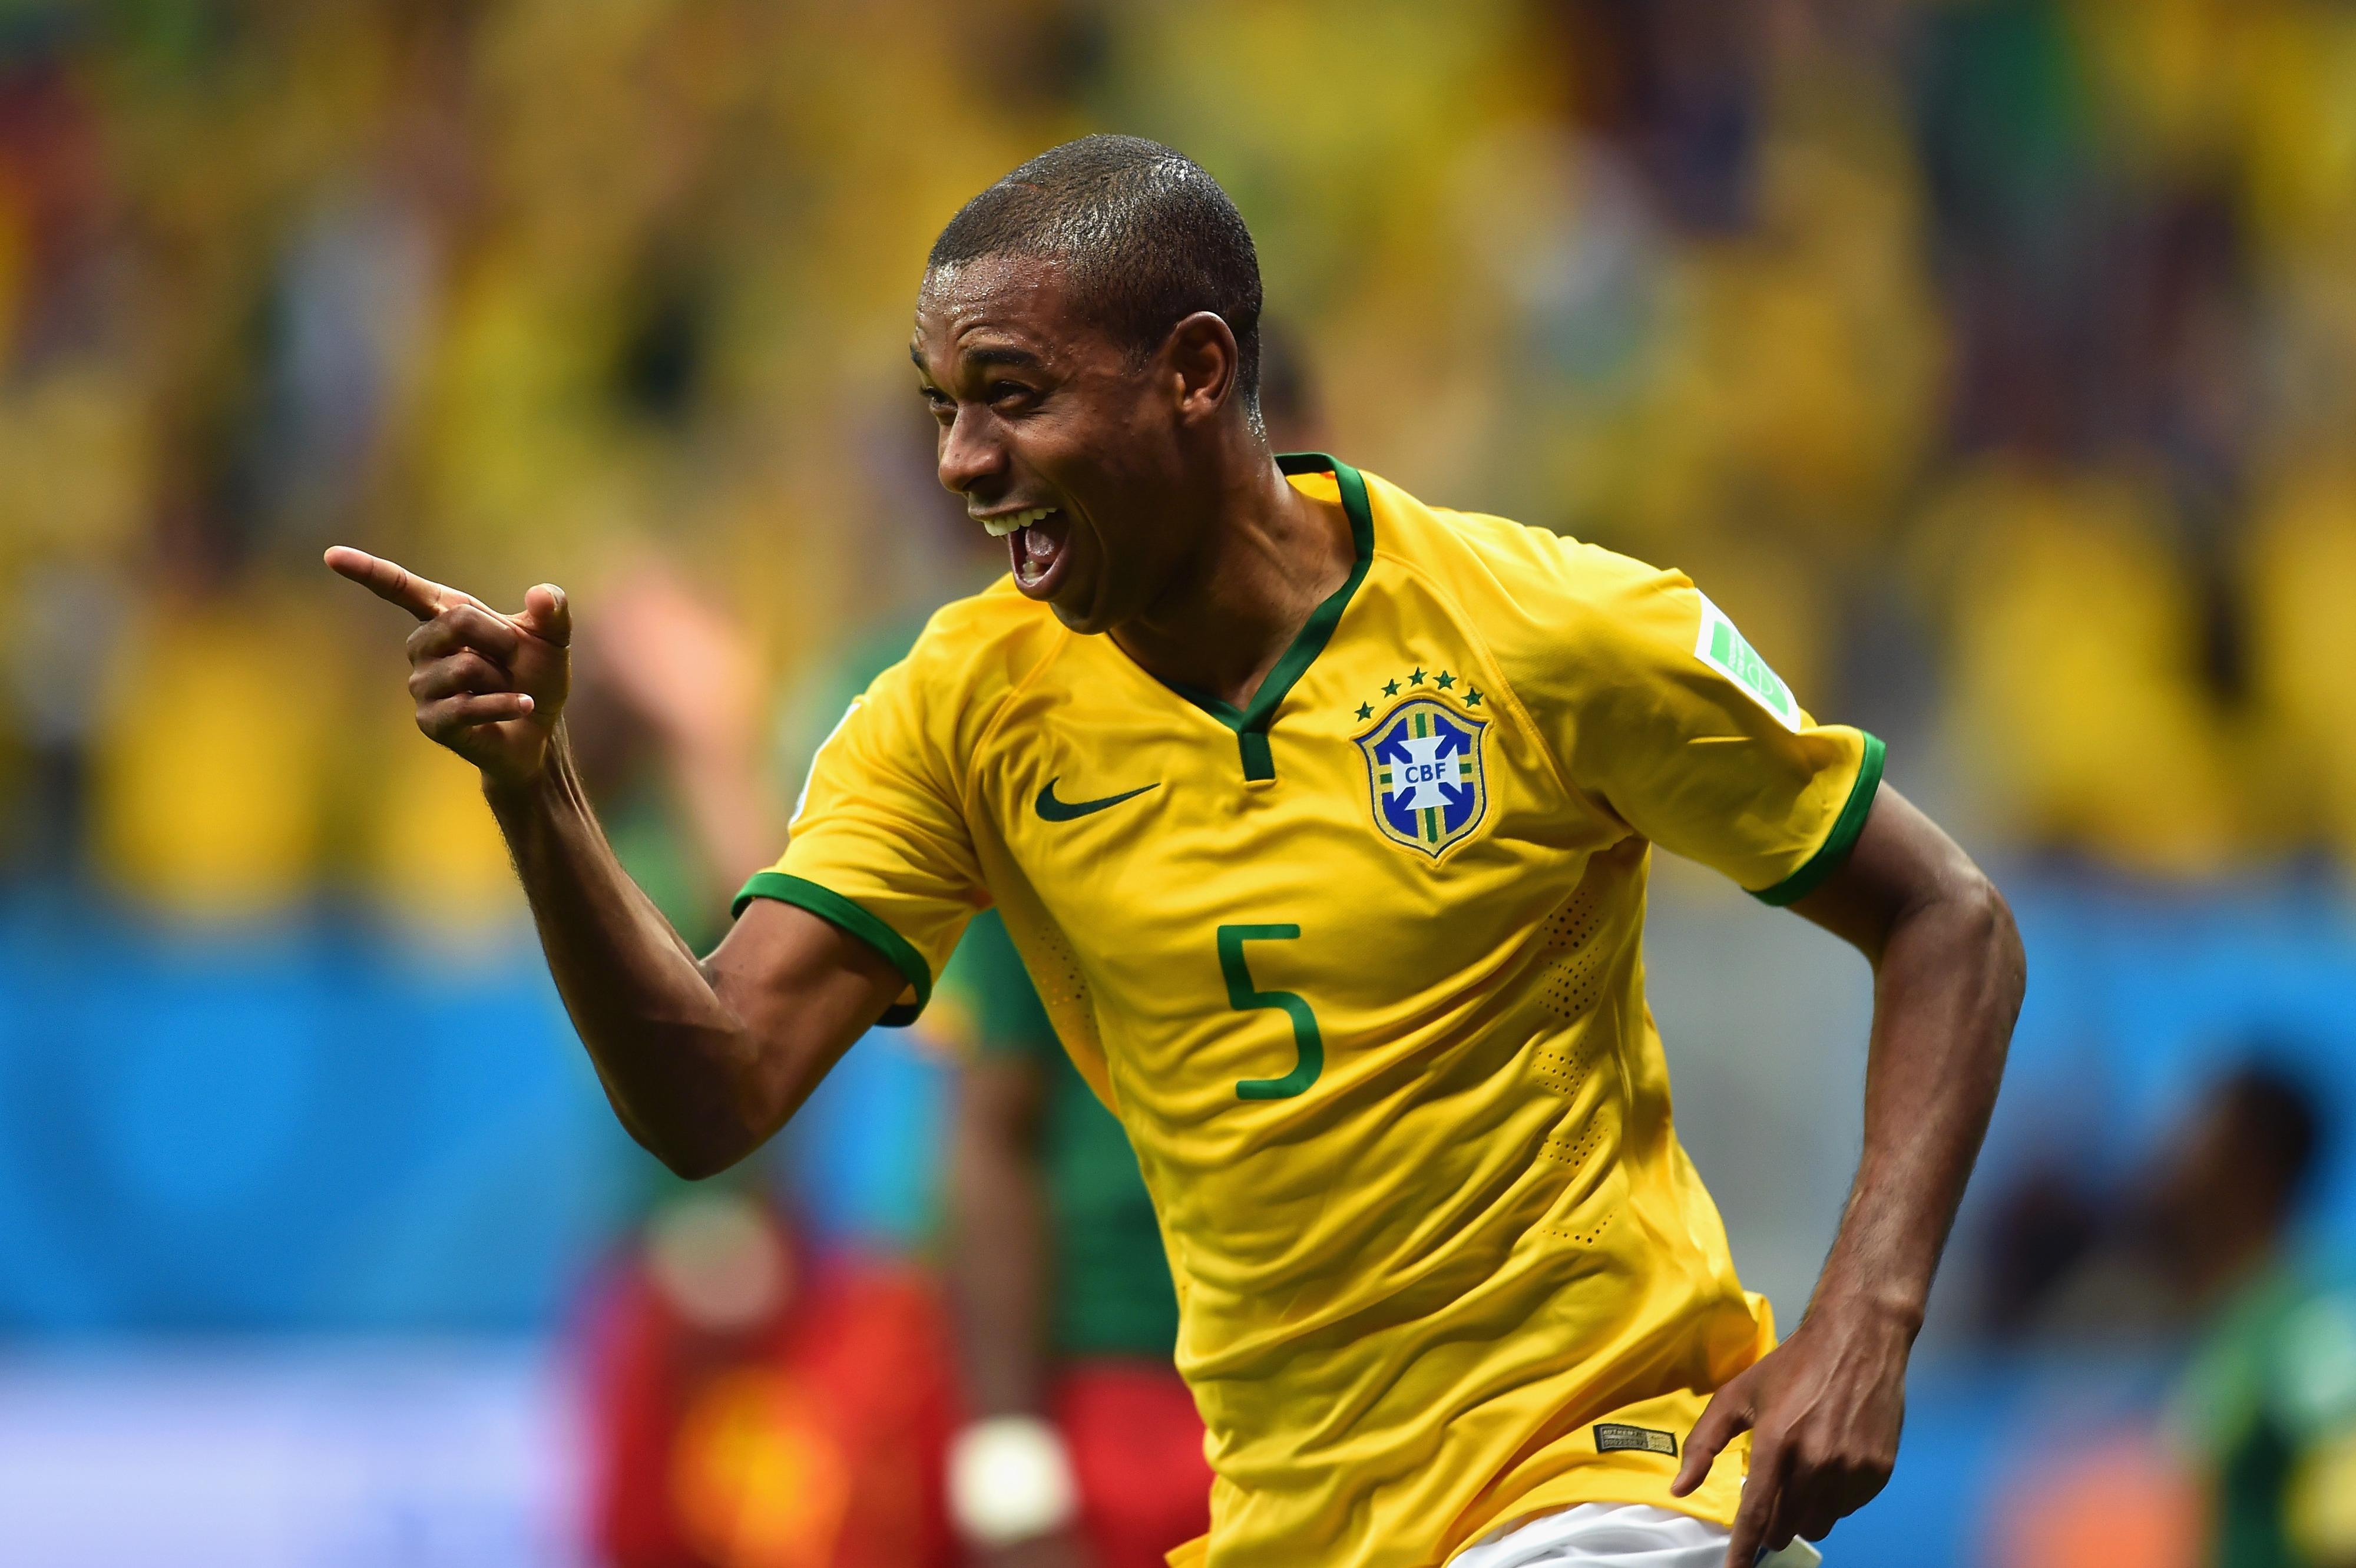 Brazil and Chile both make a single lineup change